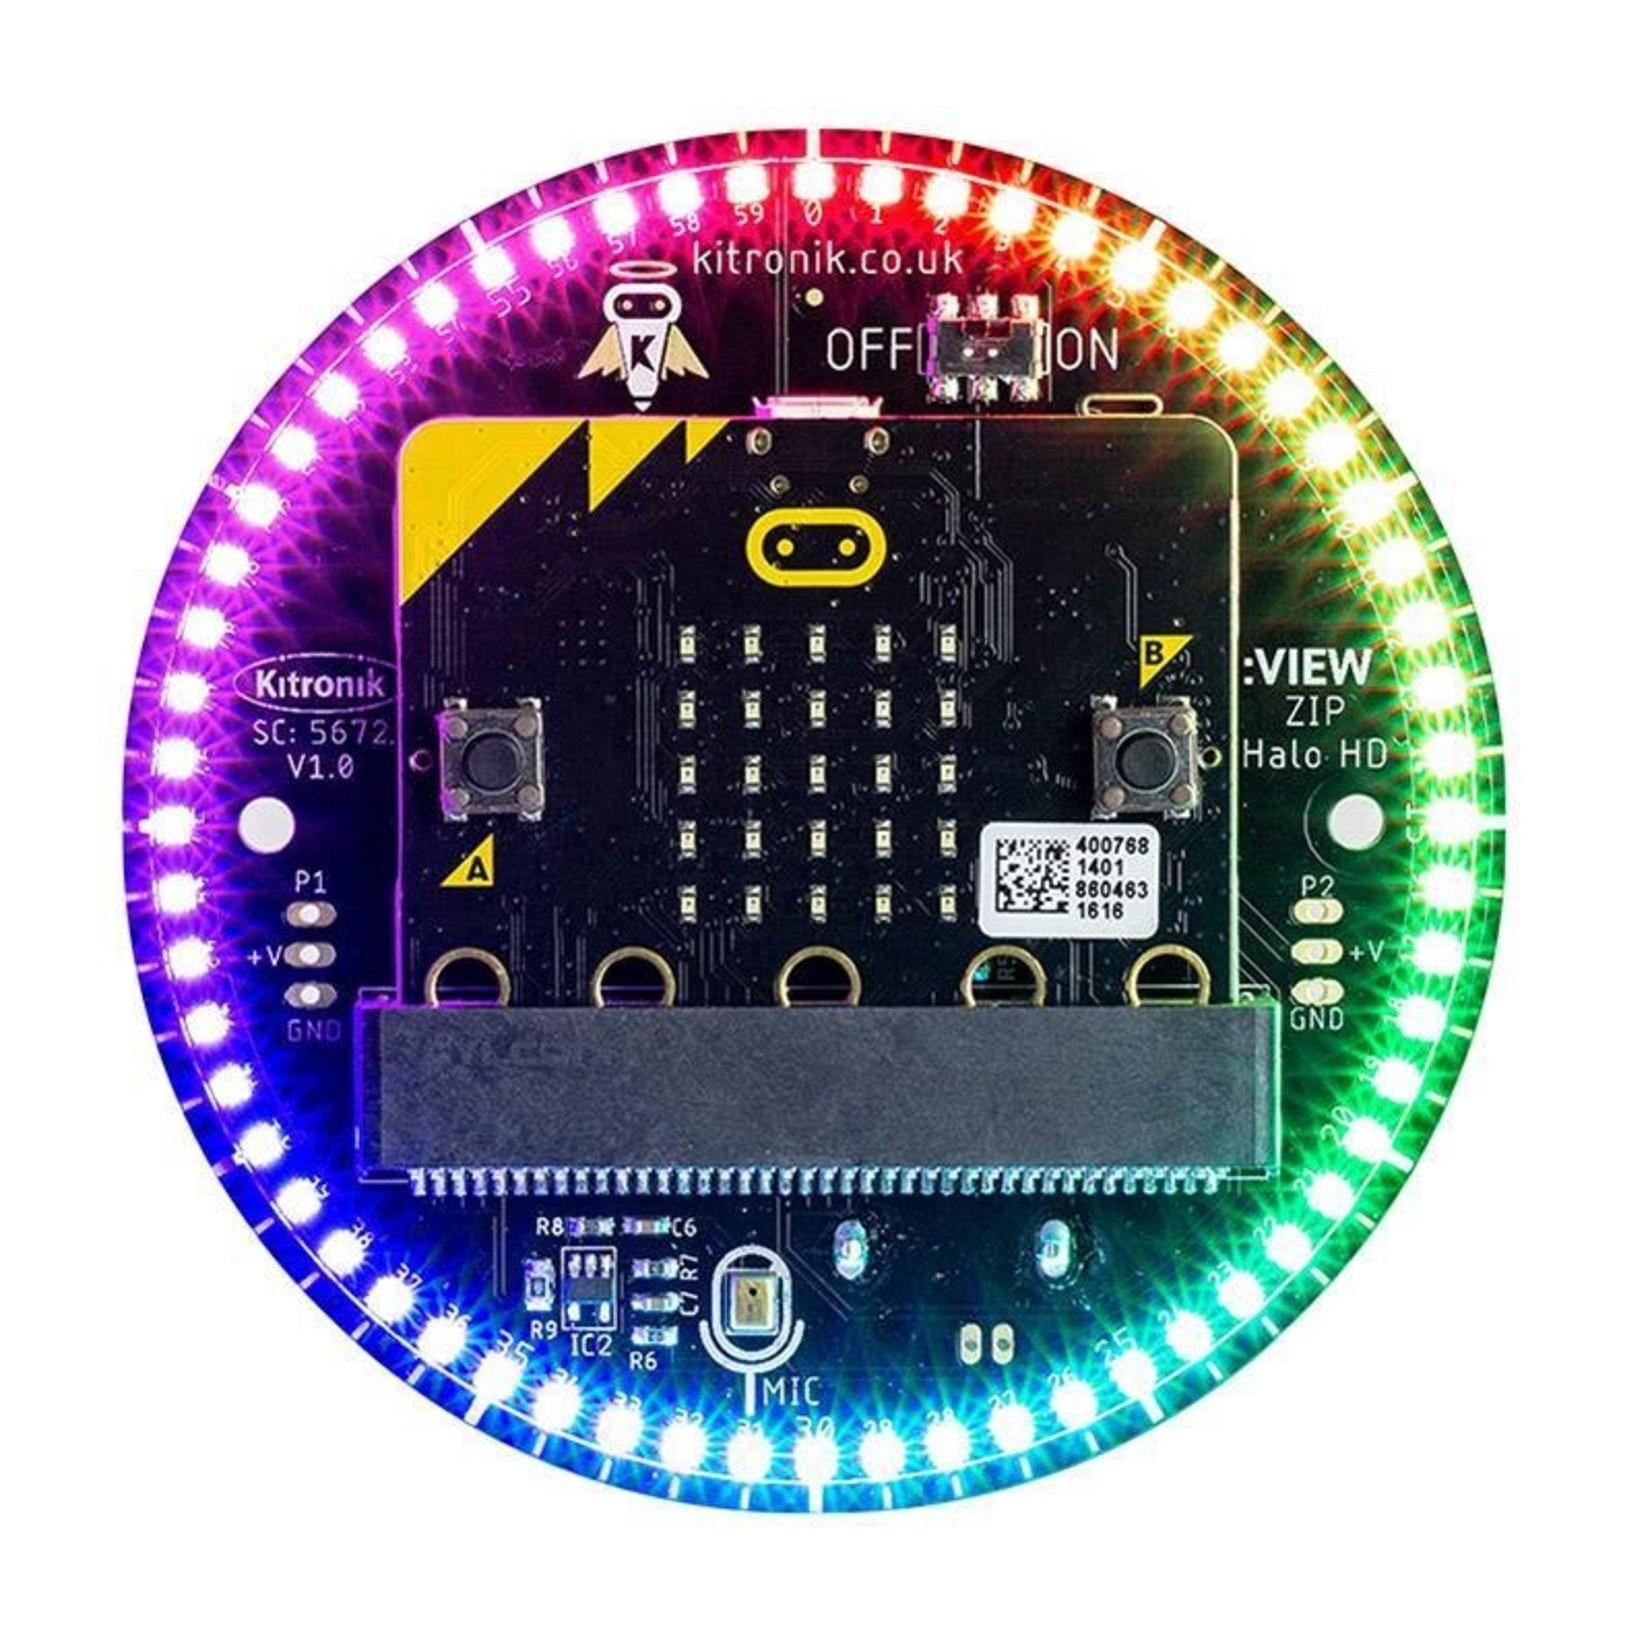 Kitronik Alarm Clock Kit with ZIP Halo HD for micro:bit